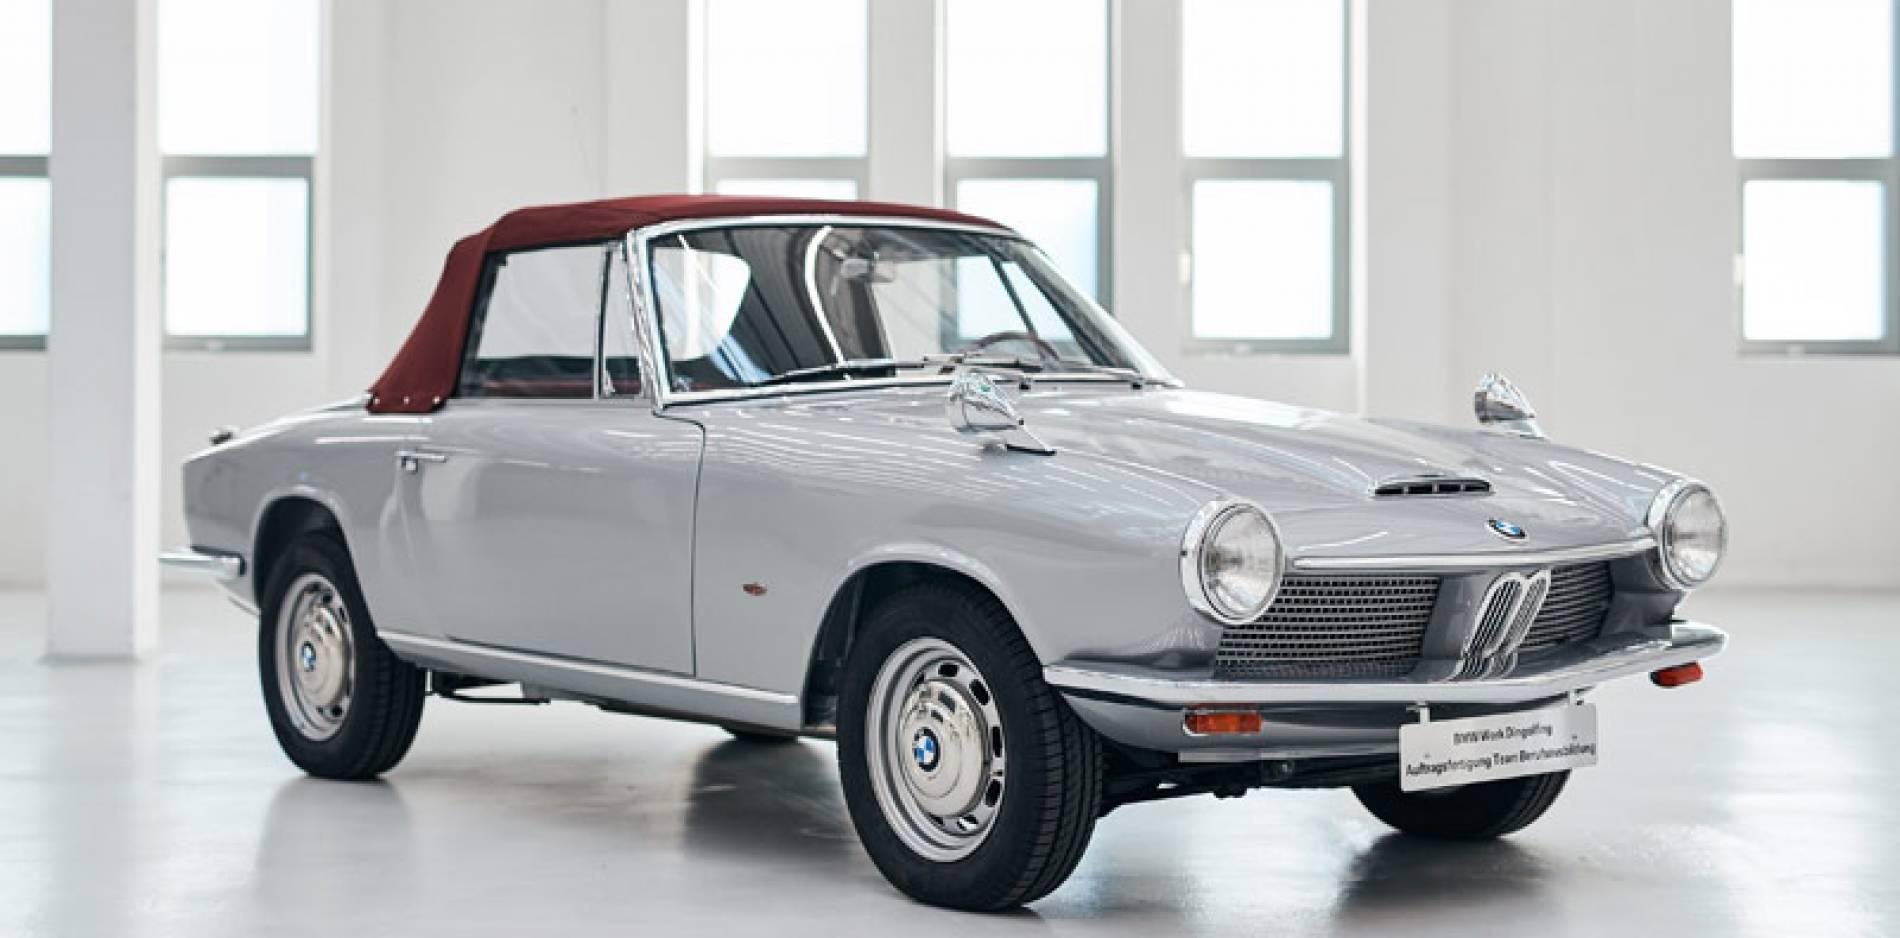 BMW restaura una rareza, un BMW 1600 GT